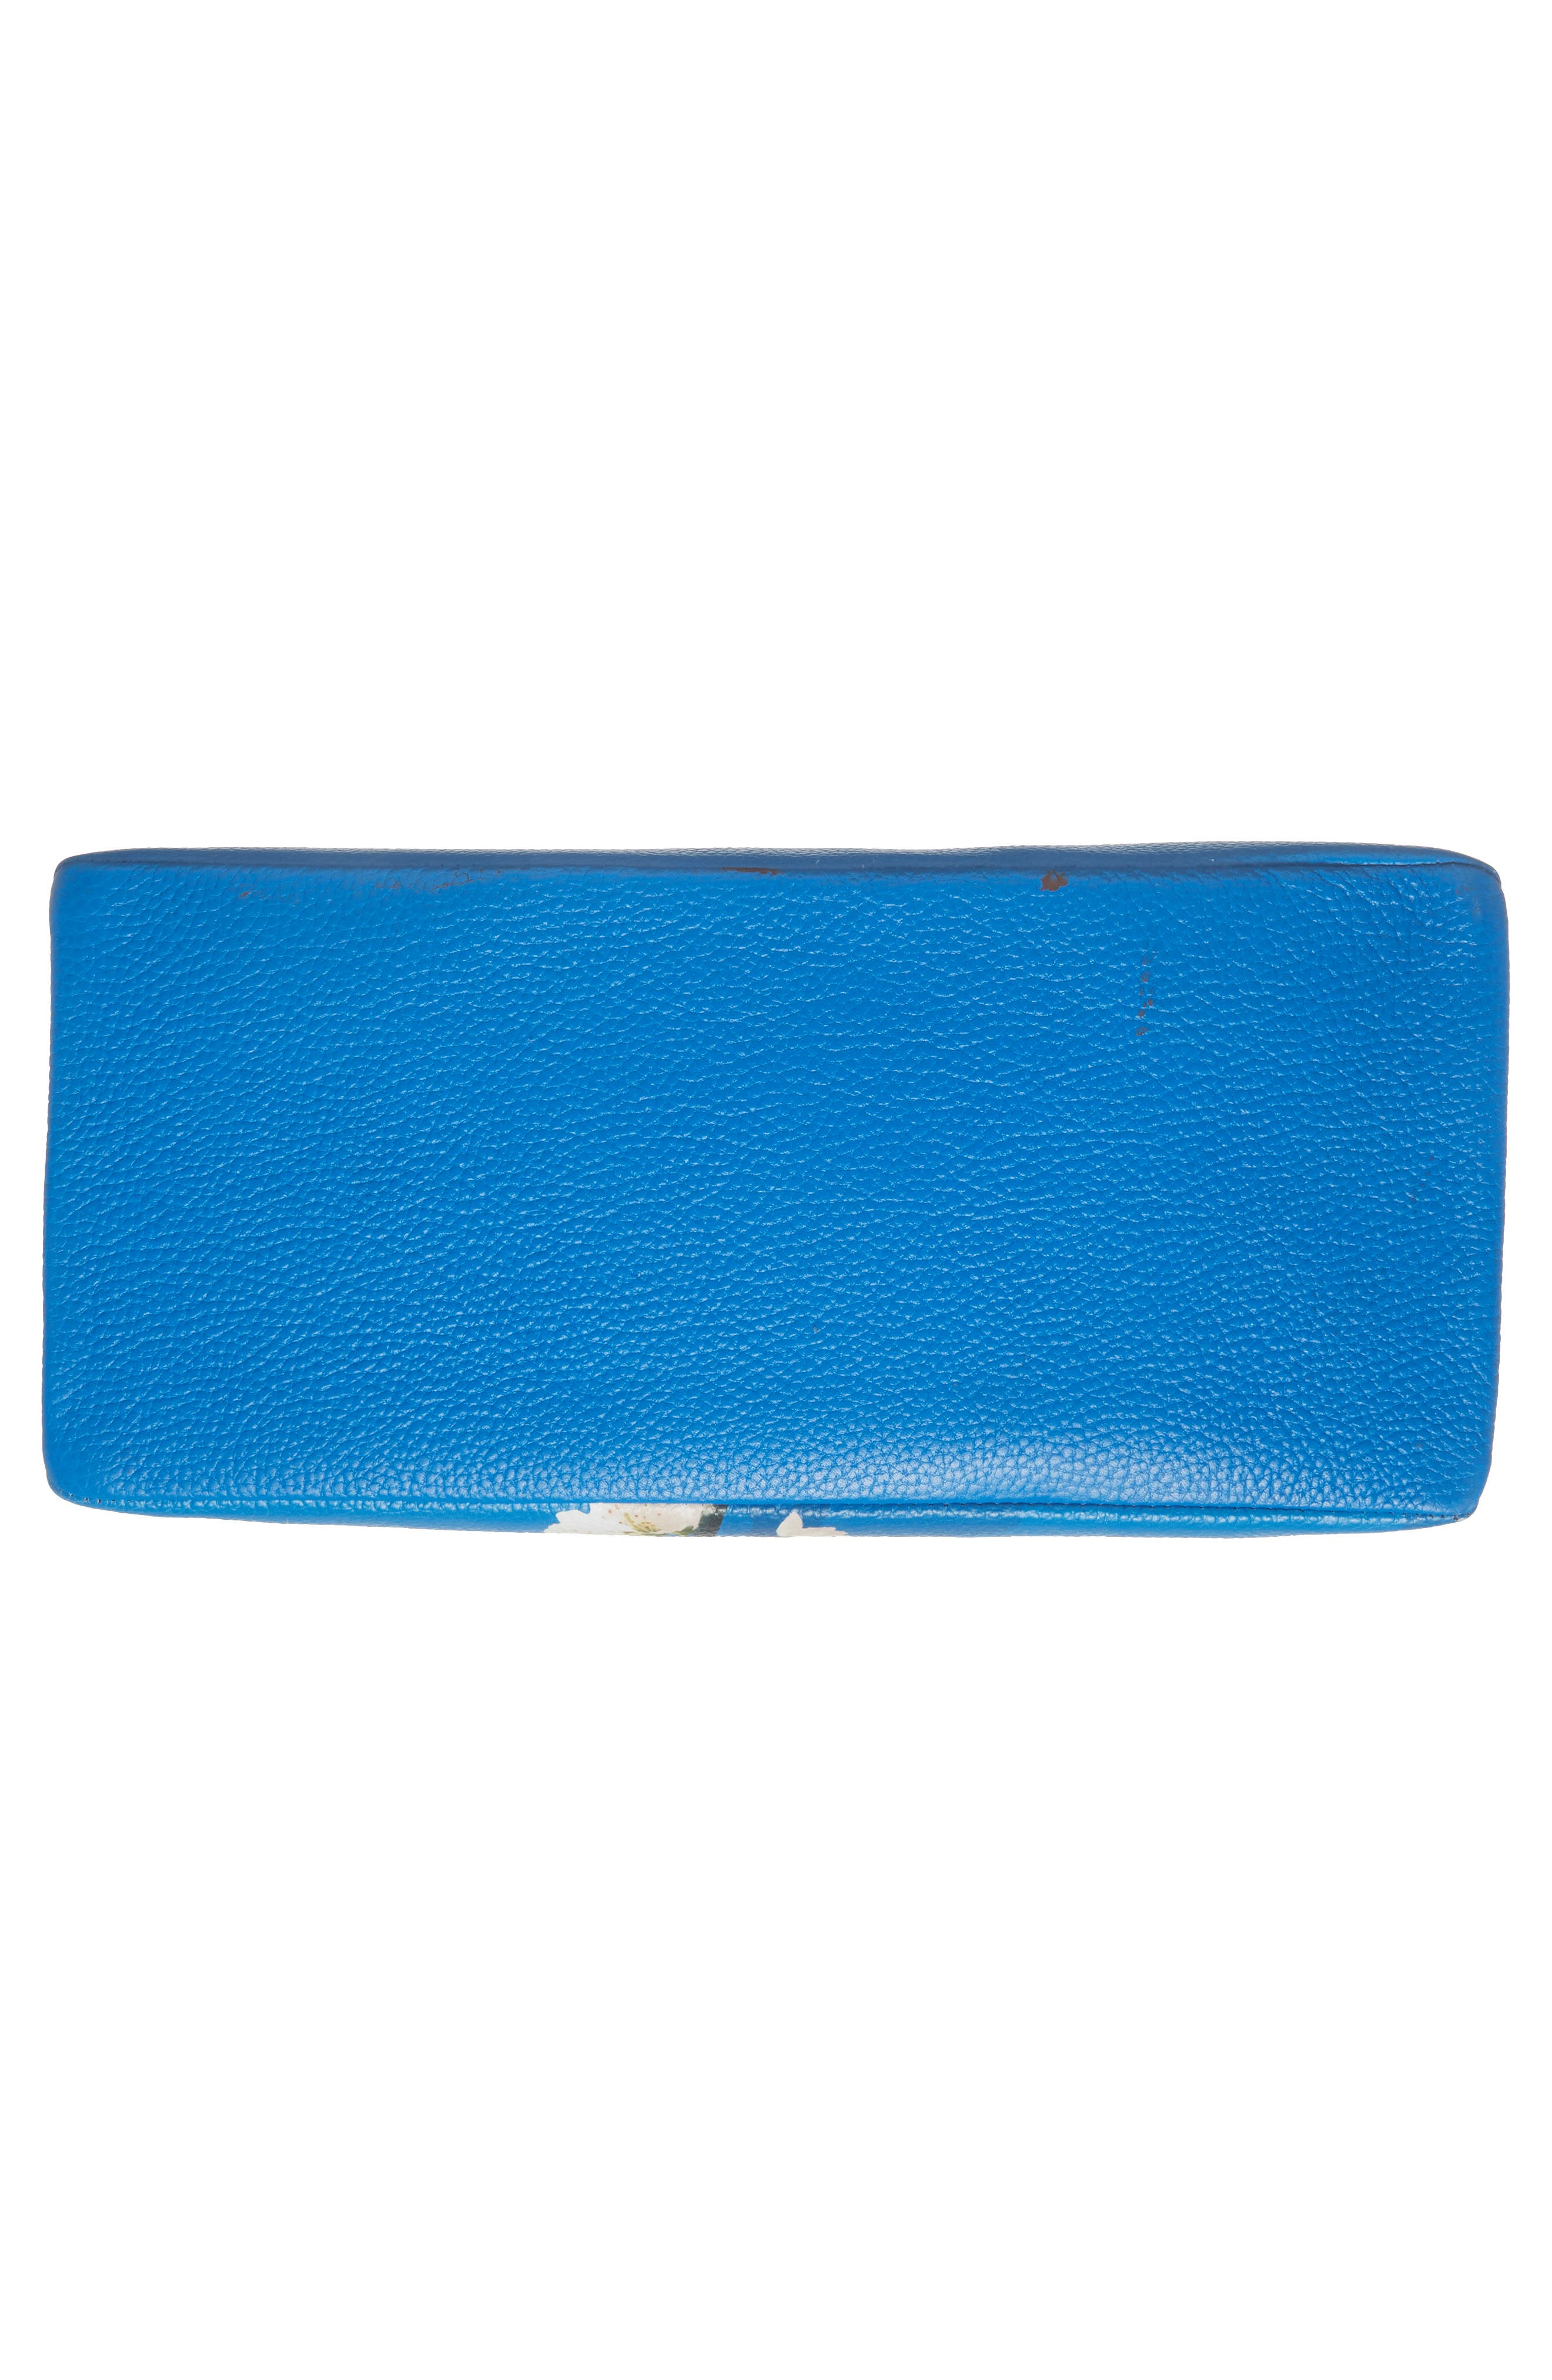 Heeidi Harmony Print Leather Shoulder Bag,                             Alternate thumbnail 5, color,                             Bright Blue